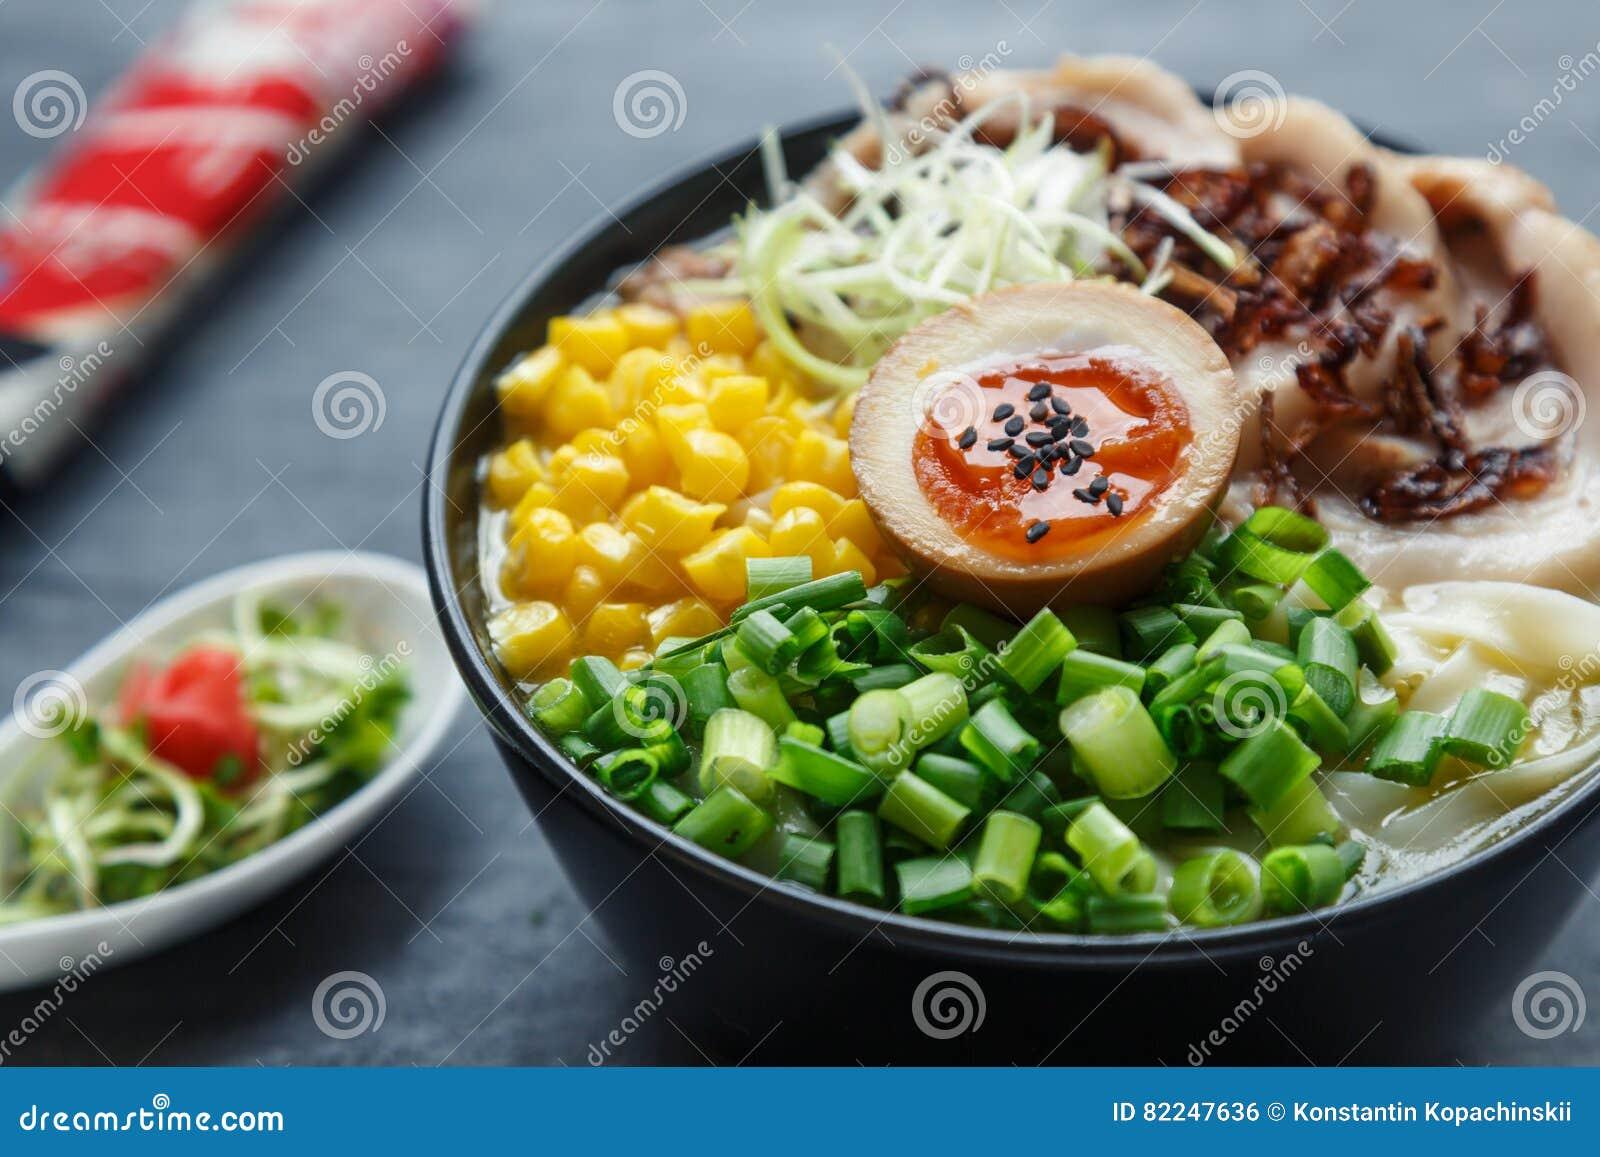 Ramen de Tonkotsu, sopa de macarronete japonesa com barriga de carne de porco, milho, cebola da mola e nitamago na parte superior